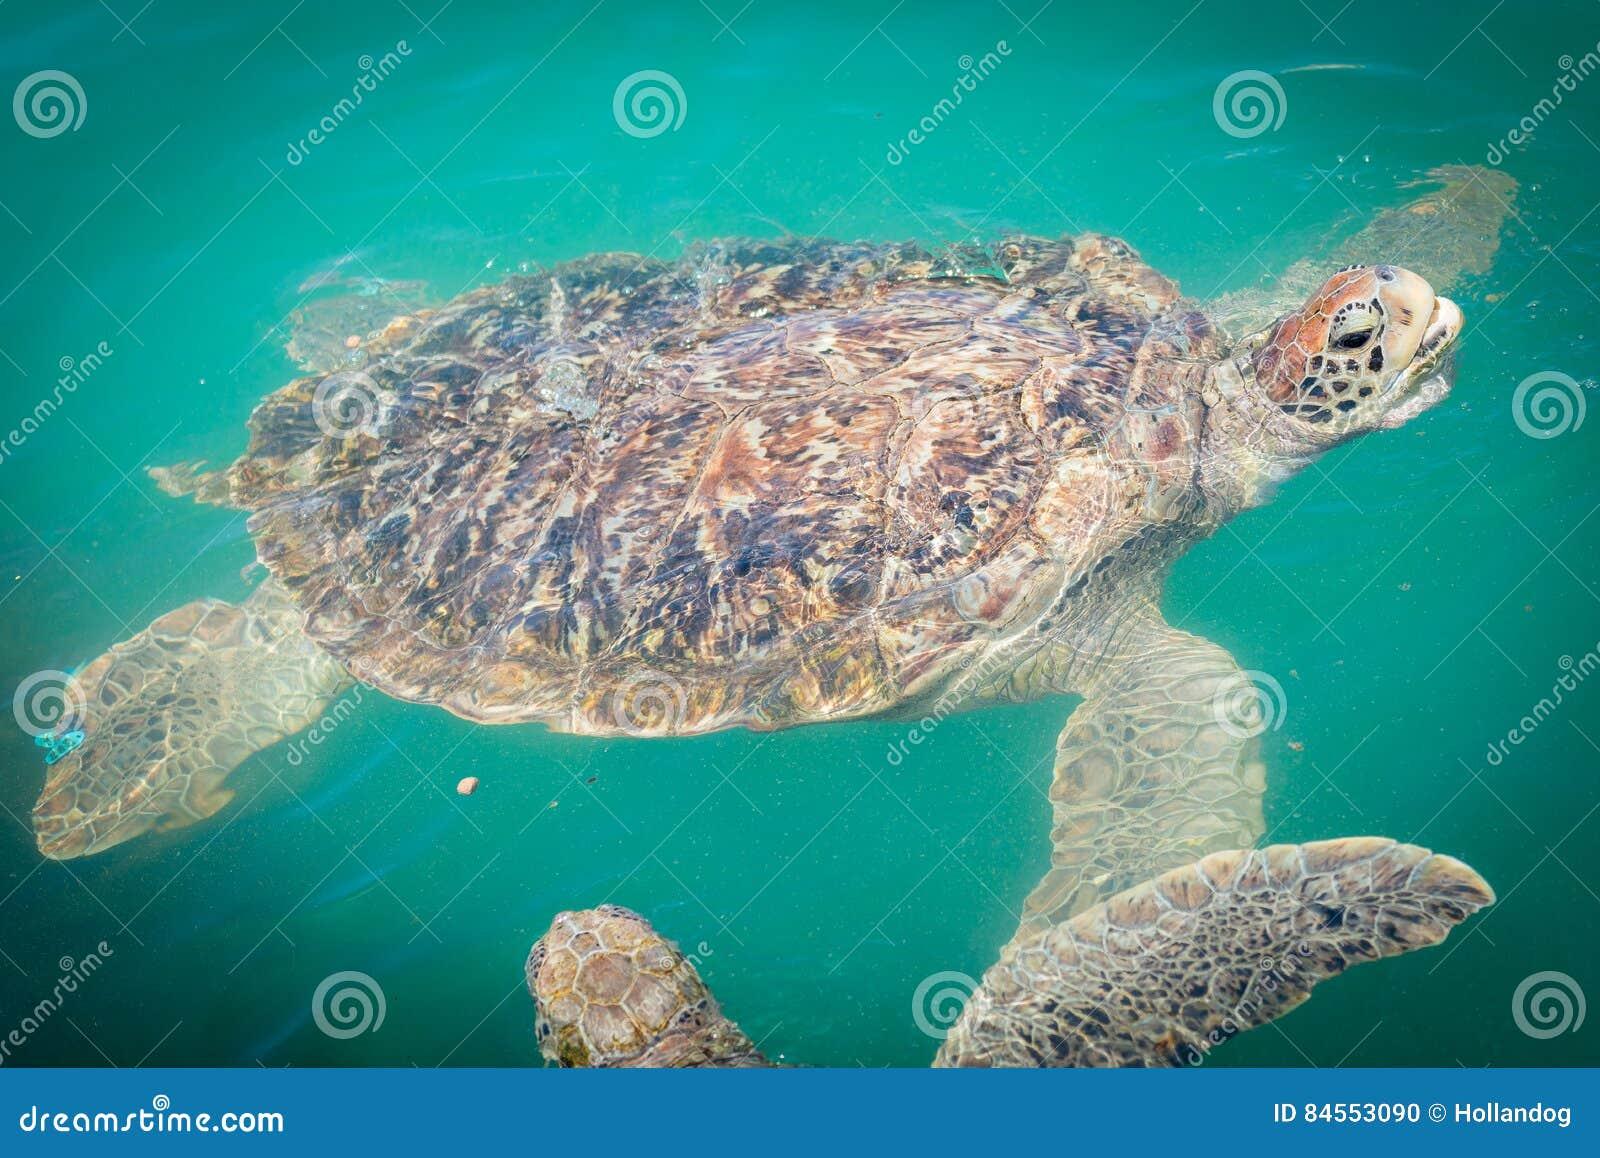 Giant sea turtle swimming stock photo. Image of huge - 84553090